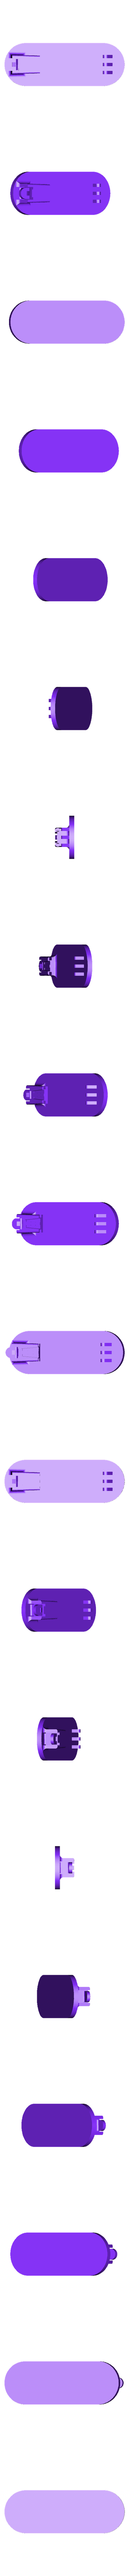 clip ceinture motorola t80 renforcé.stl Download free STL file Belt clip walkie-talkie motorola T80 • Model to 3D print, Tom_le_Belk